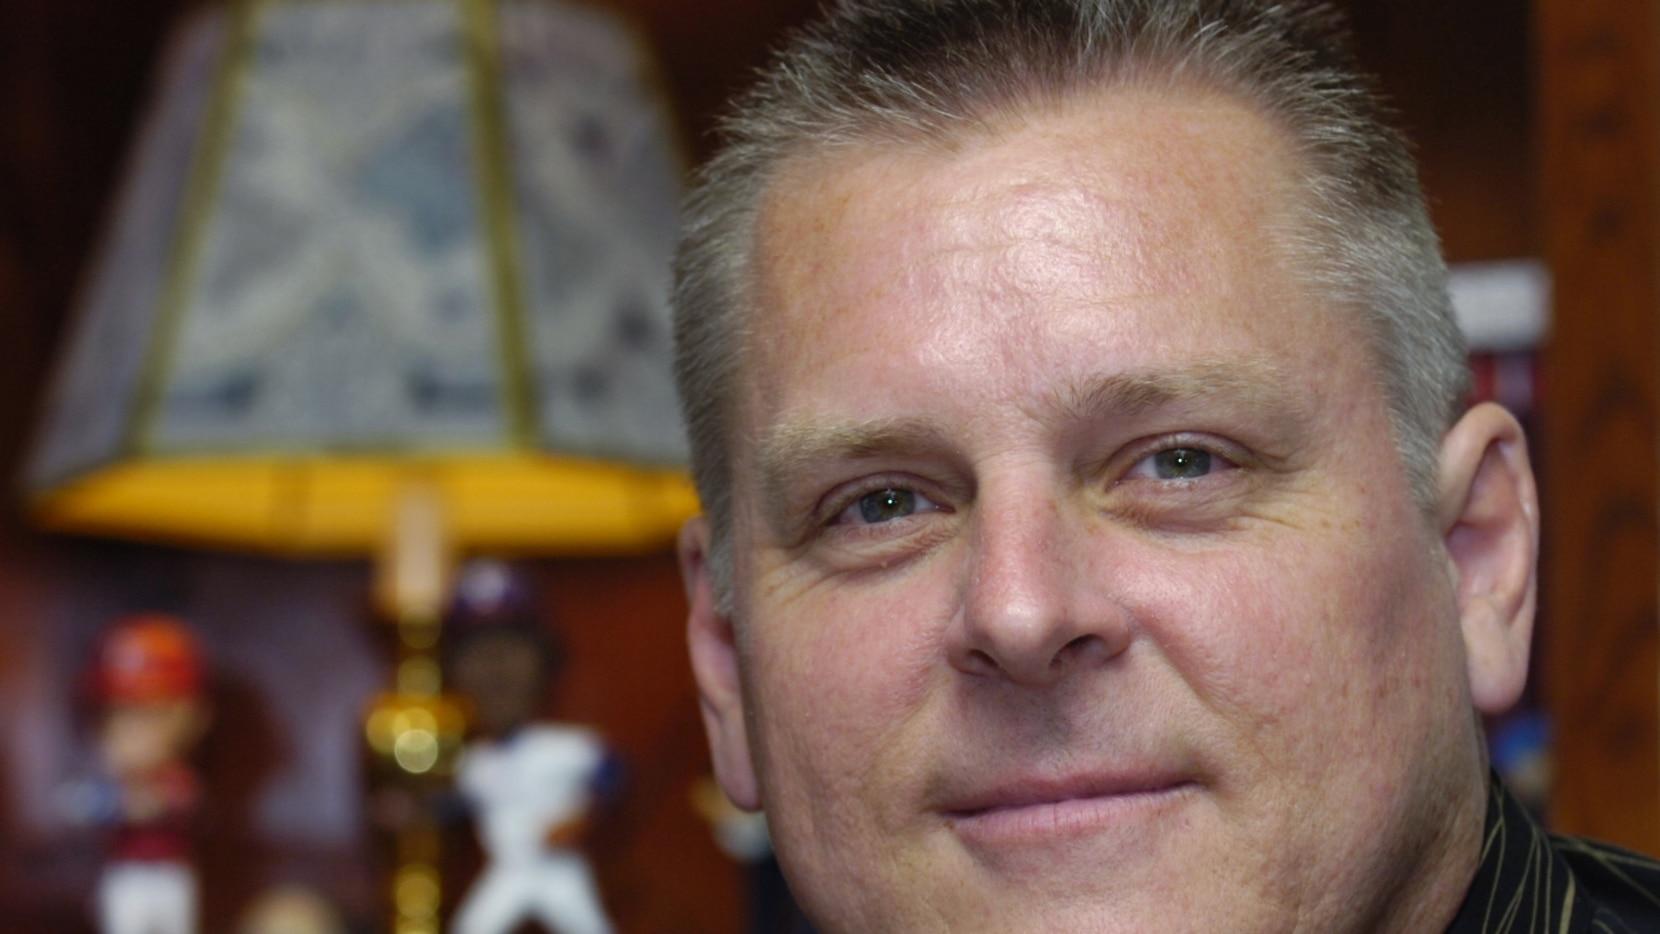 Rangers radio announcer Dave Barnett, a Denton native, at his home on Wednesday July 15, 2009.